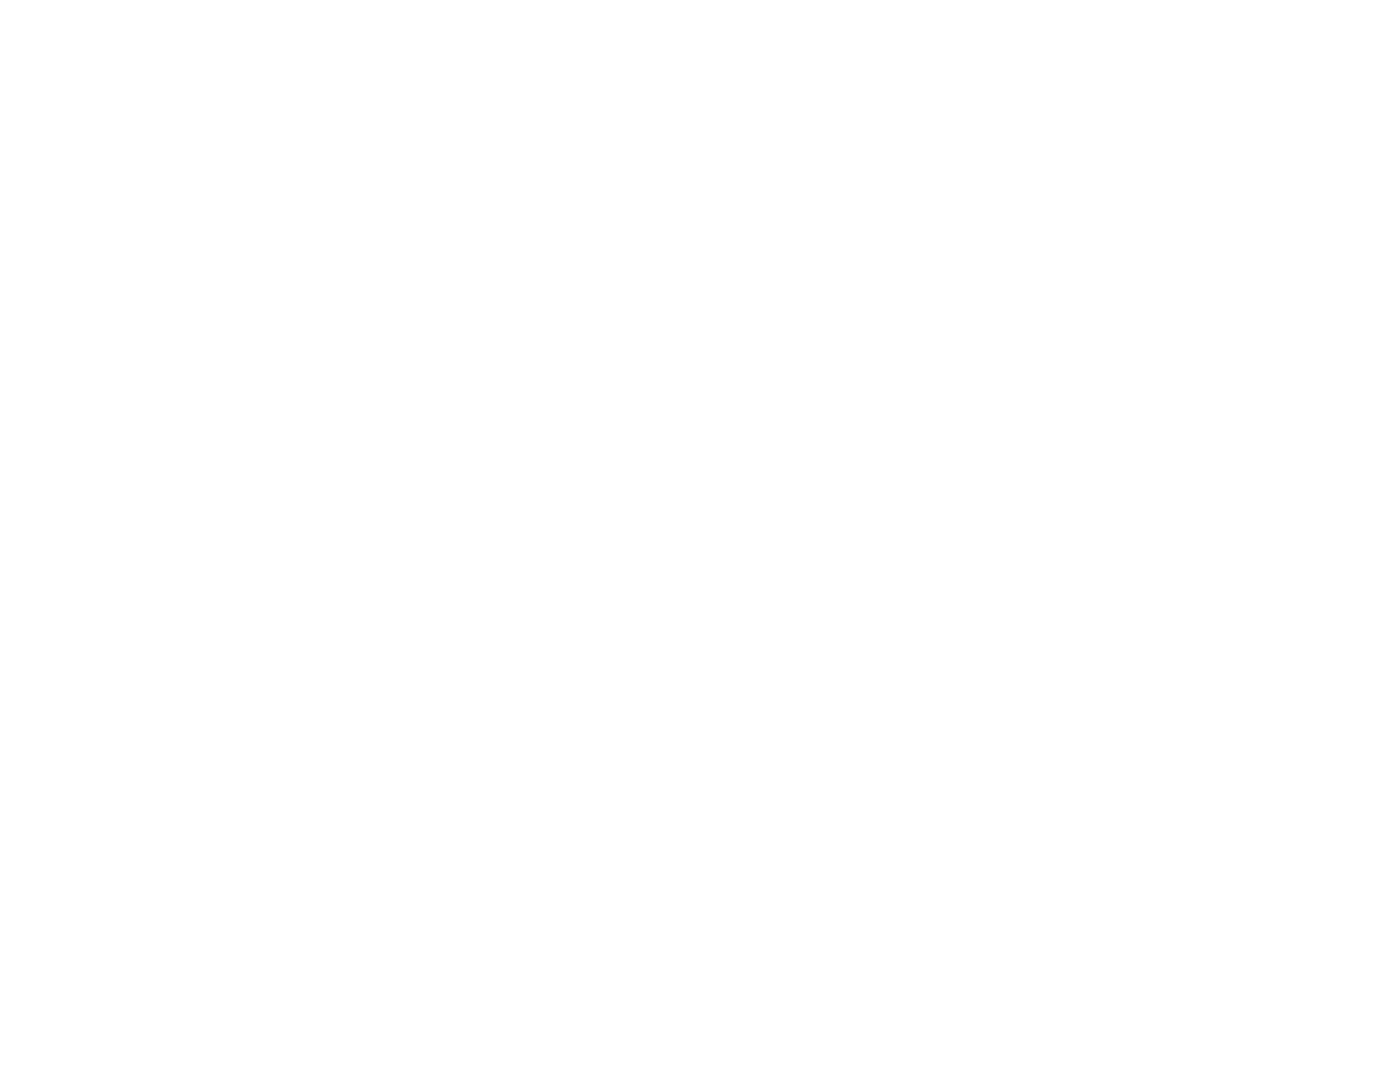 mbs-logo-05.png